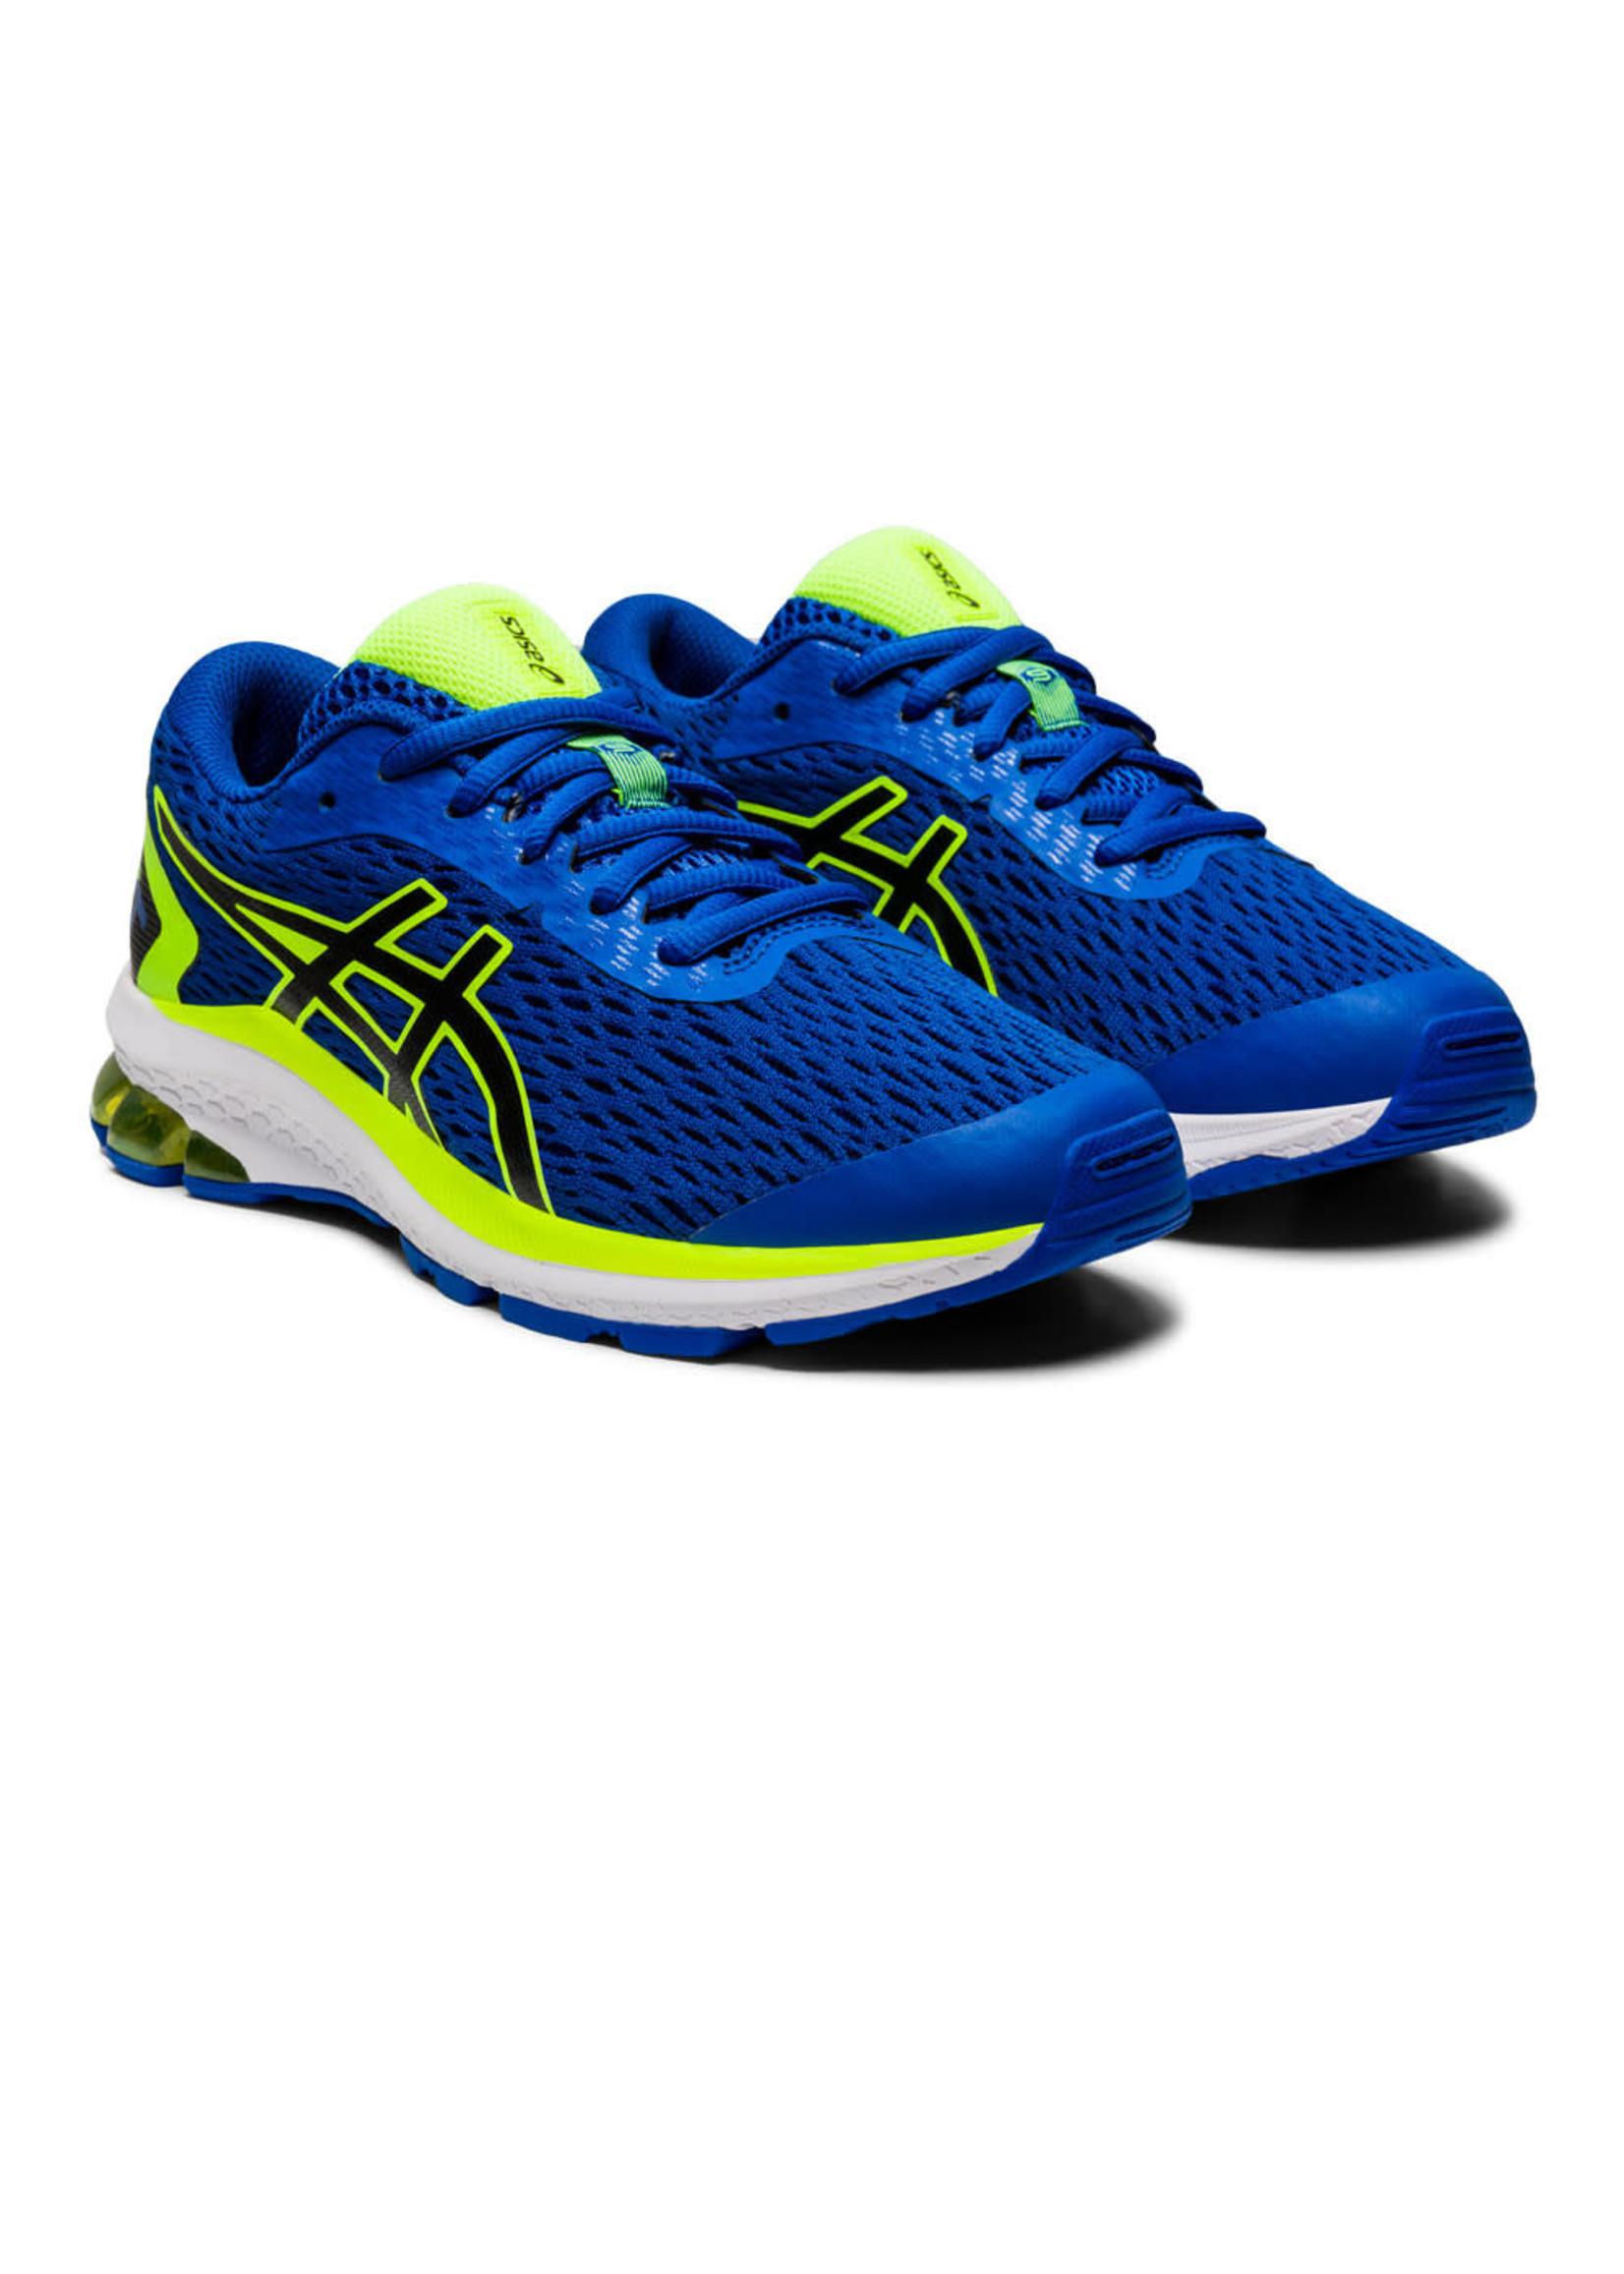 Asics Asics GT-1000 9 Junior Running Shoe - GS (2020) - Tuna Blue